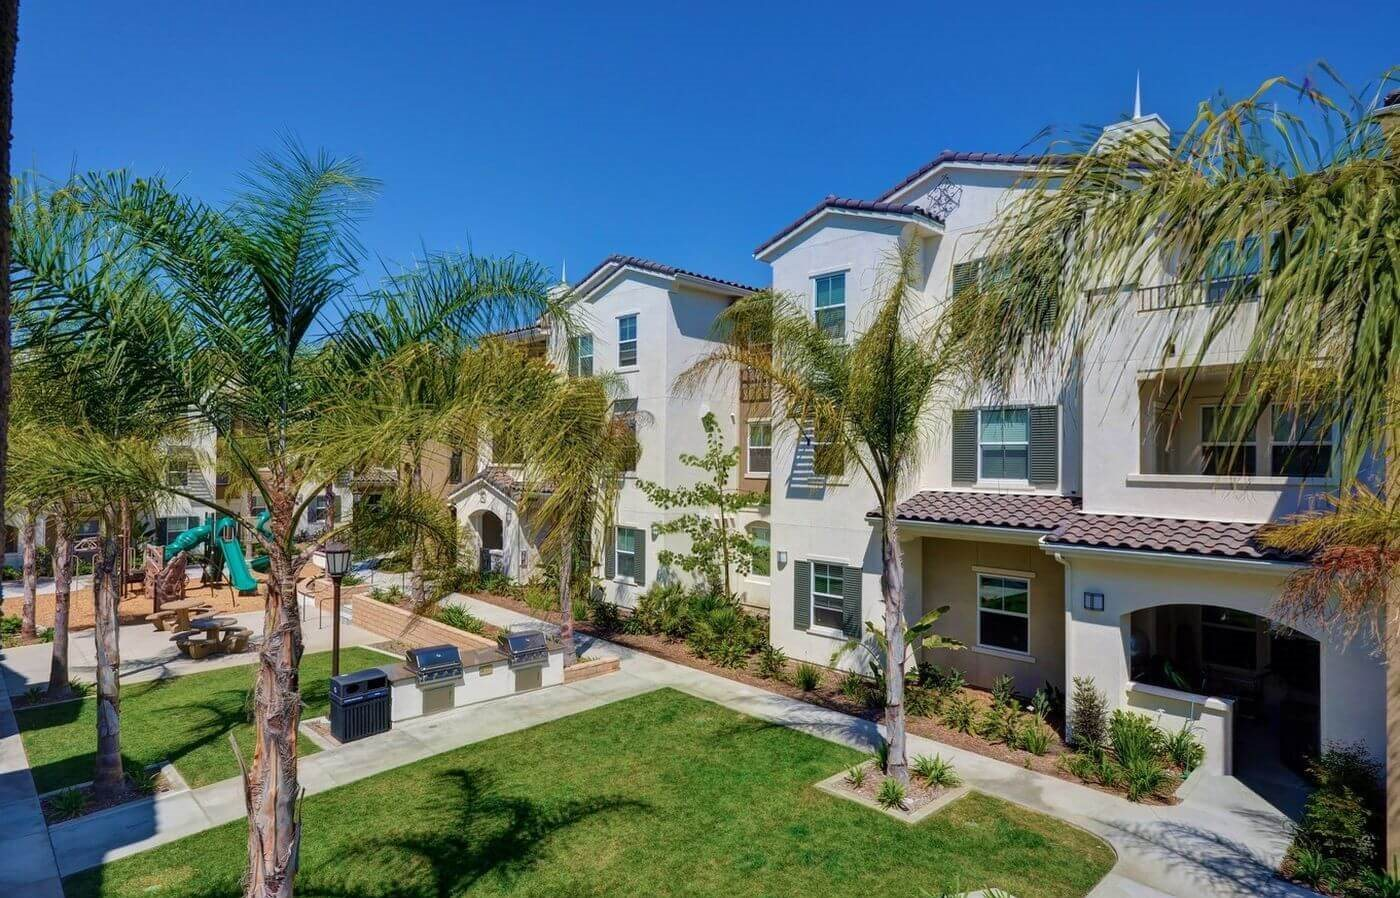 Beautifully Landscaped Grounds, at Rosina Vista, Chula Vista, CA